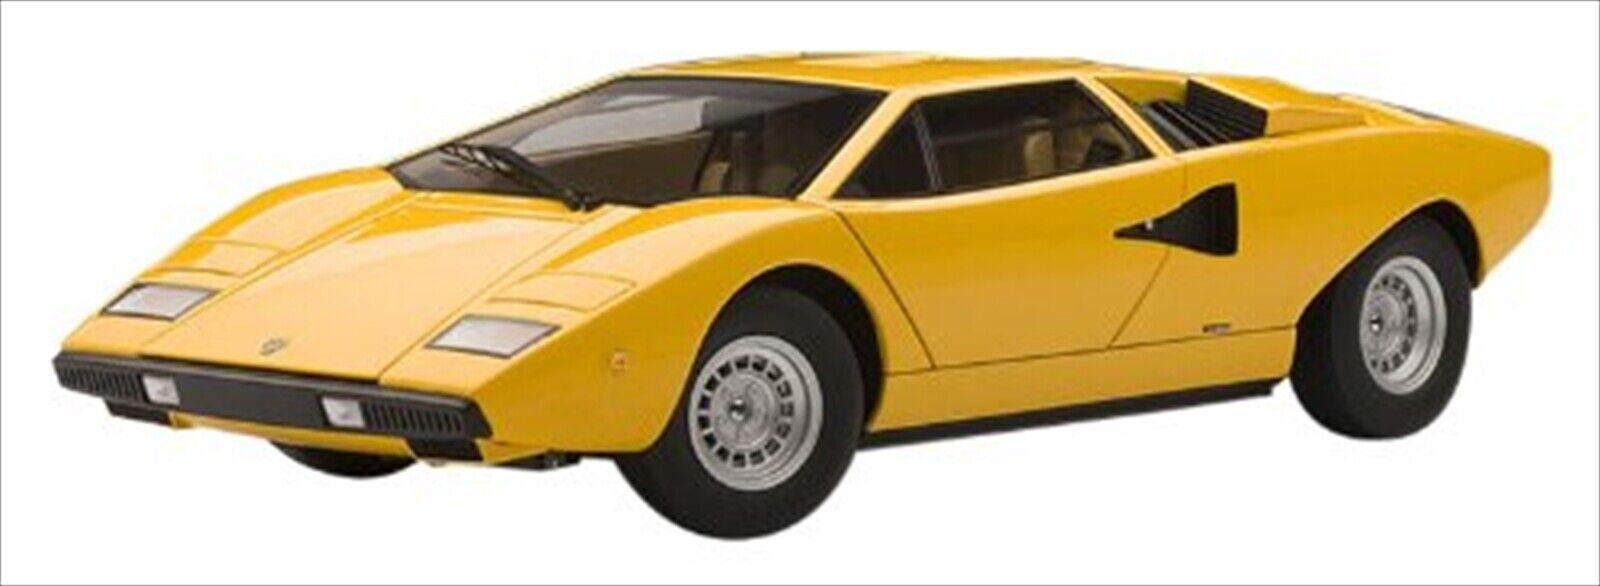 mejor moda Nuevo Autoart 1 18 Lamborghini counterk LP400 (Amarillo) 74646 74646 74646 F S W   De rastreo Japón  los clientes primero